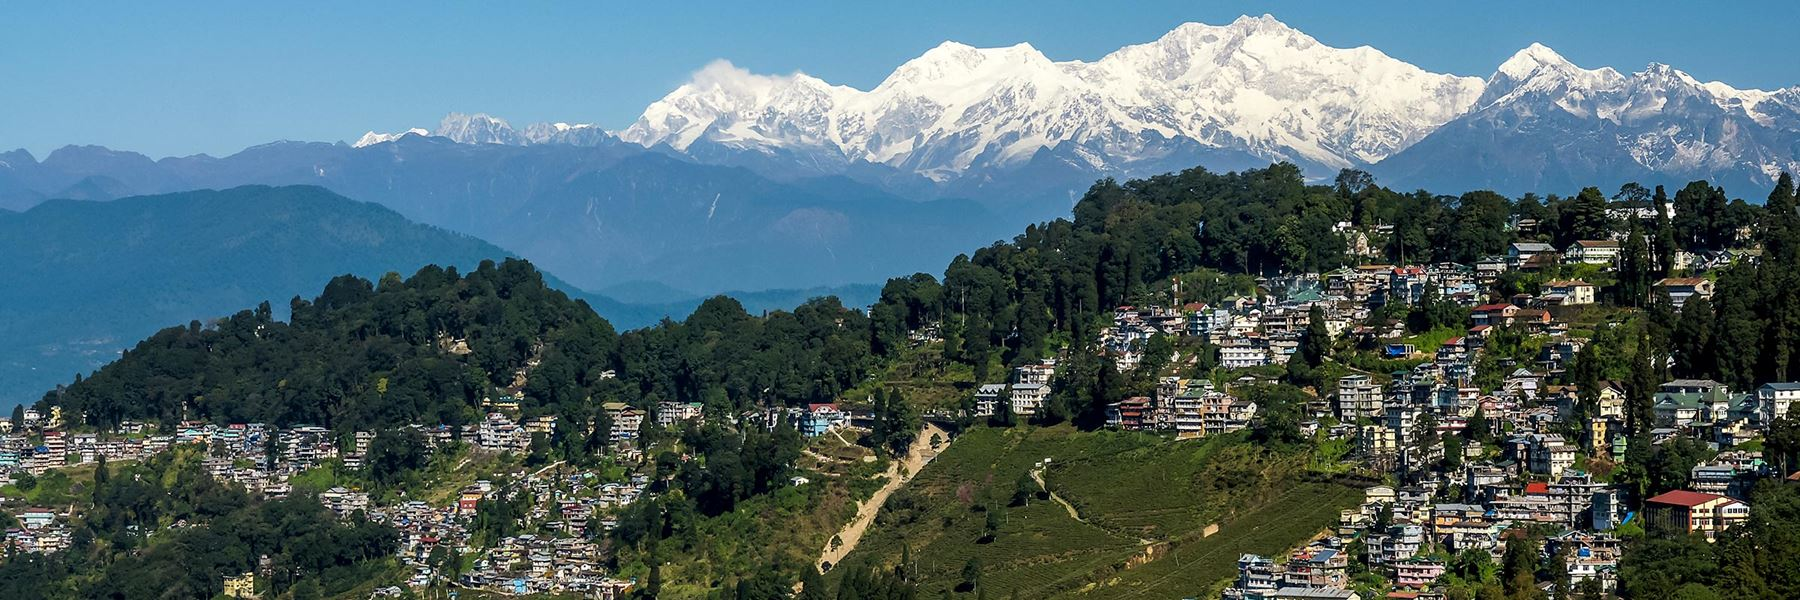 Bhutan Darjeeling And Sikkim The Jewels Of The Eastern Himalayas Hi On Life Adventures